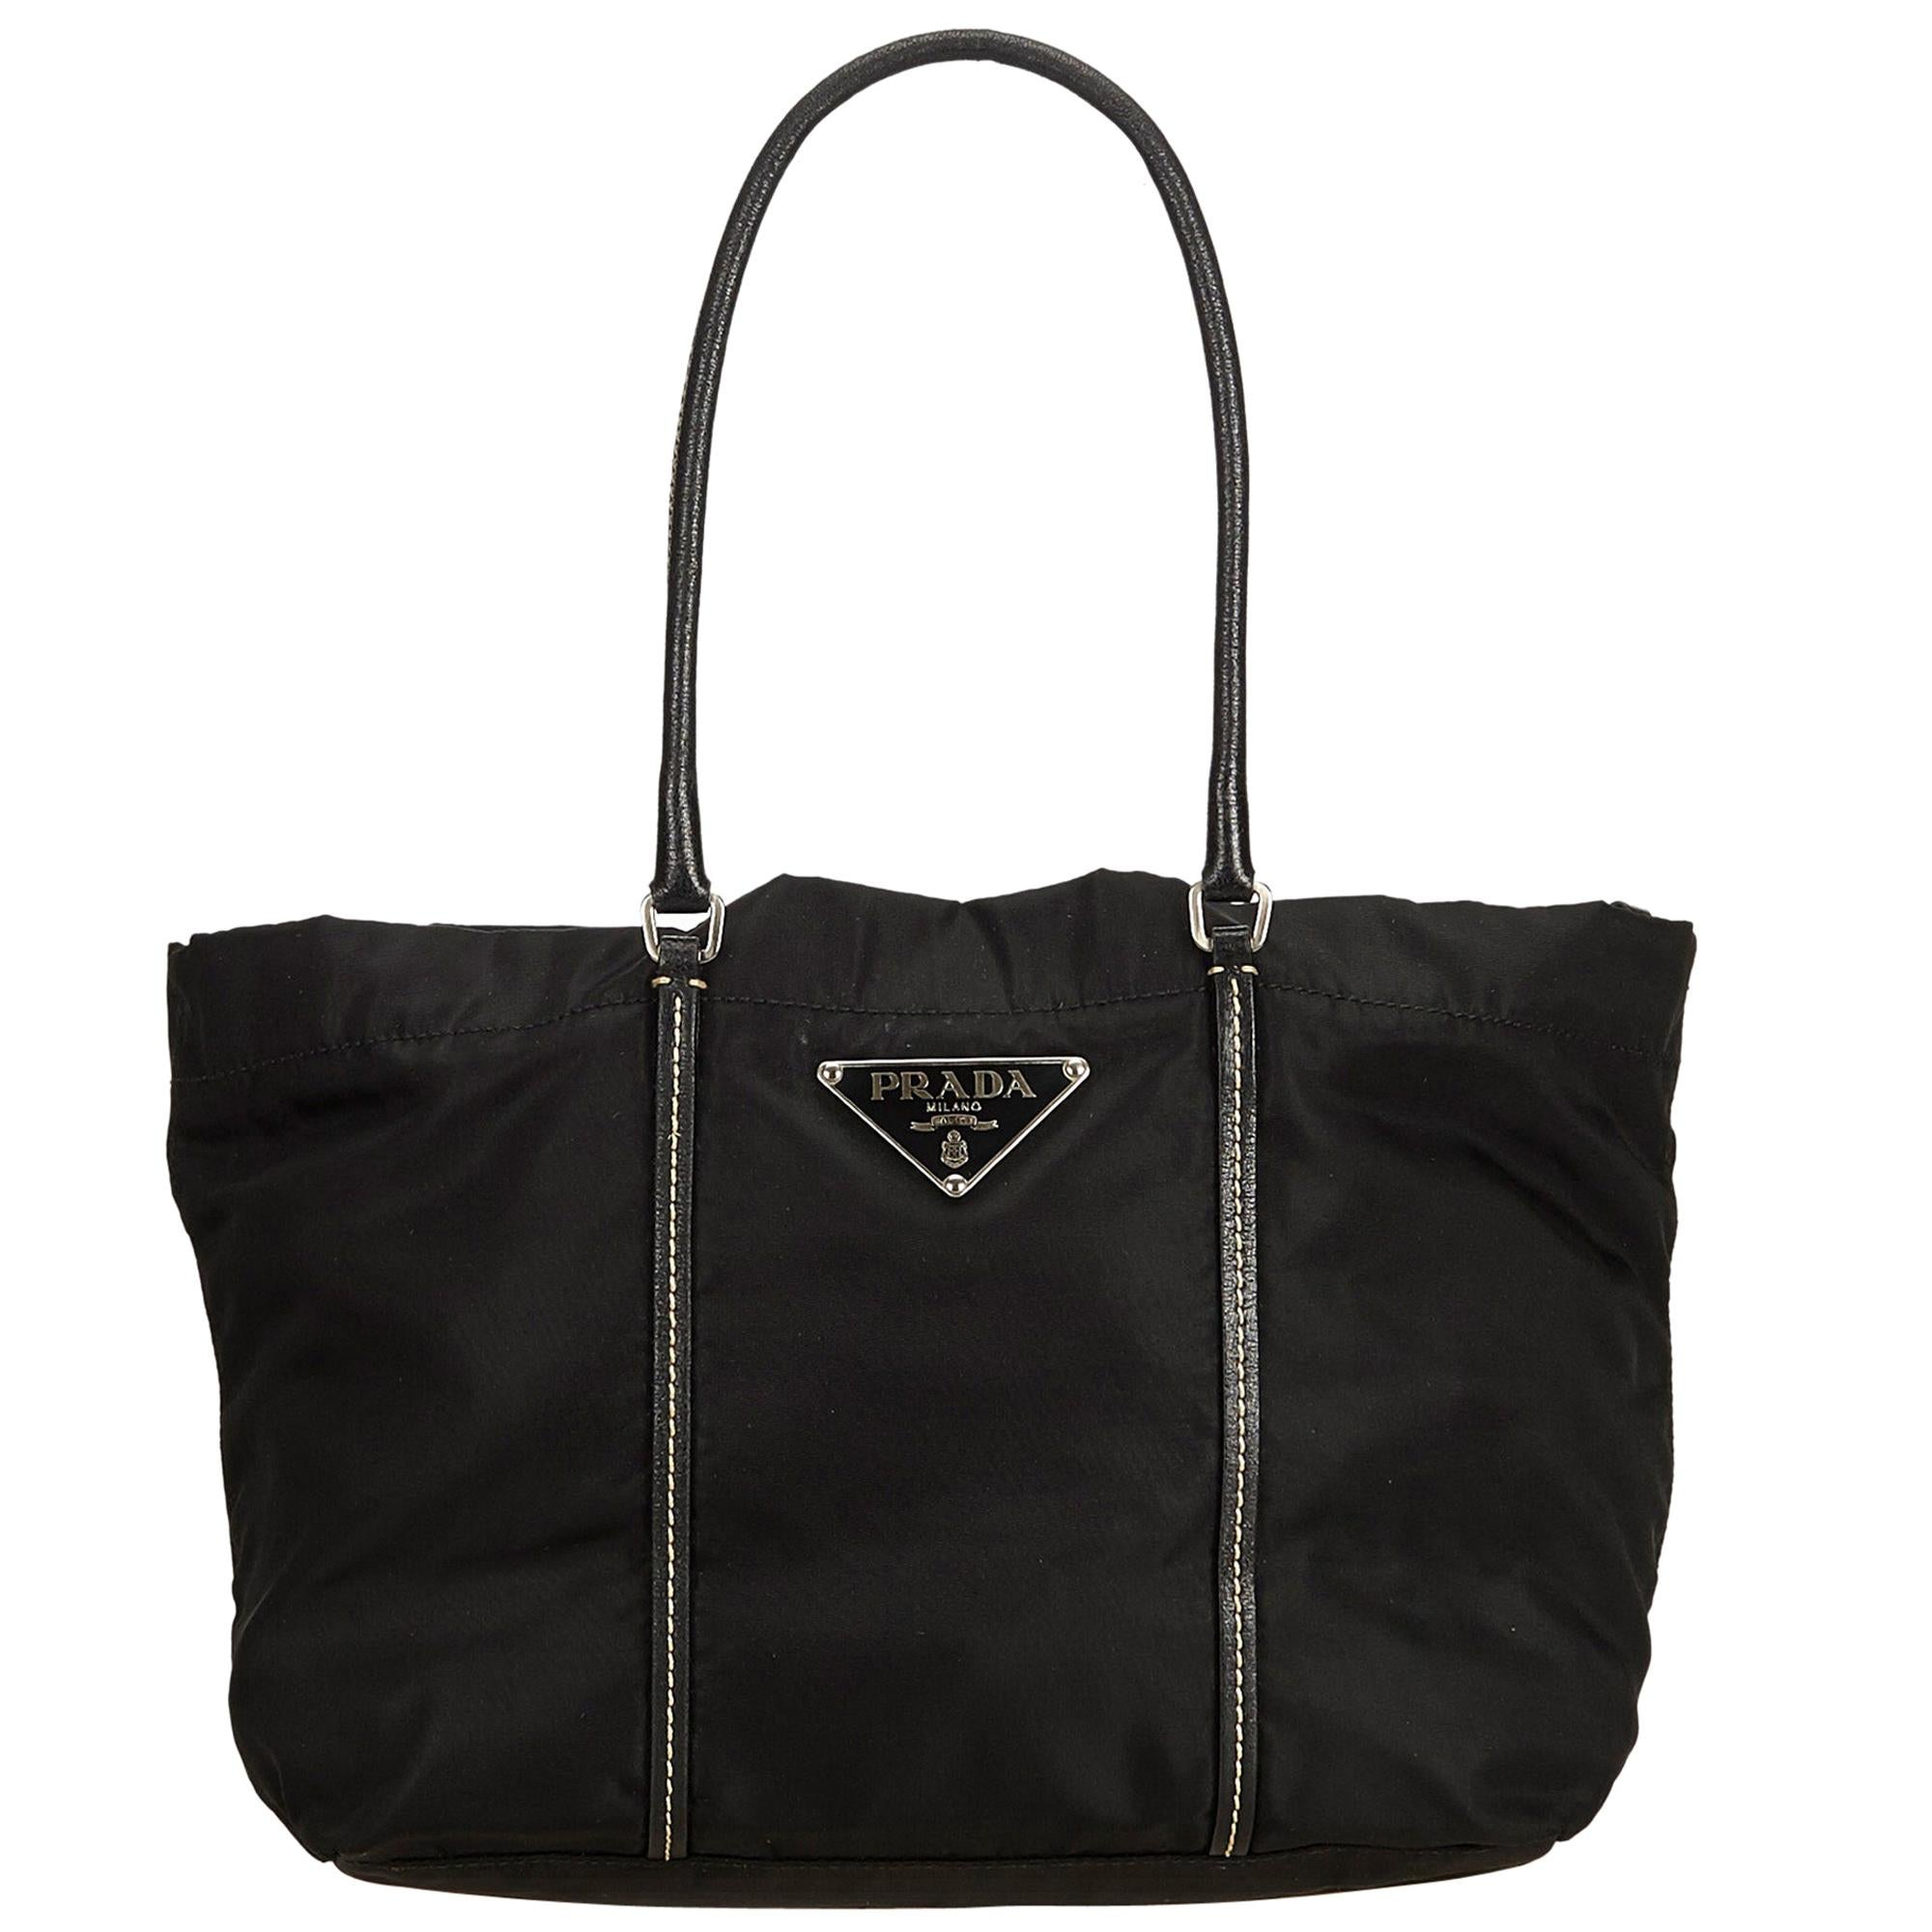 fb241a08ab5b Vintage Prada Handbags and Purses - 1,245 For Sale at 1stdibs